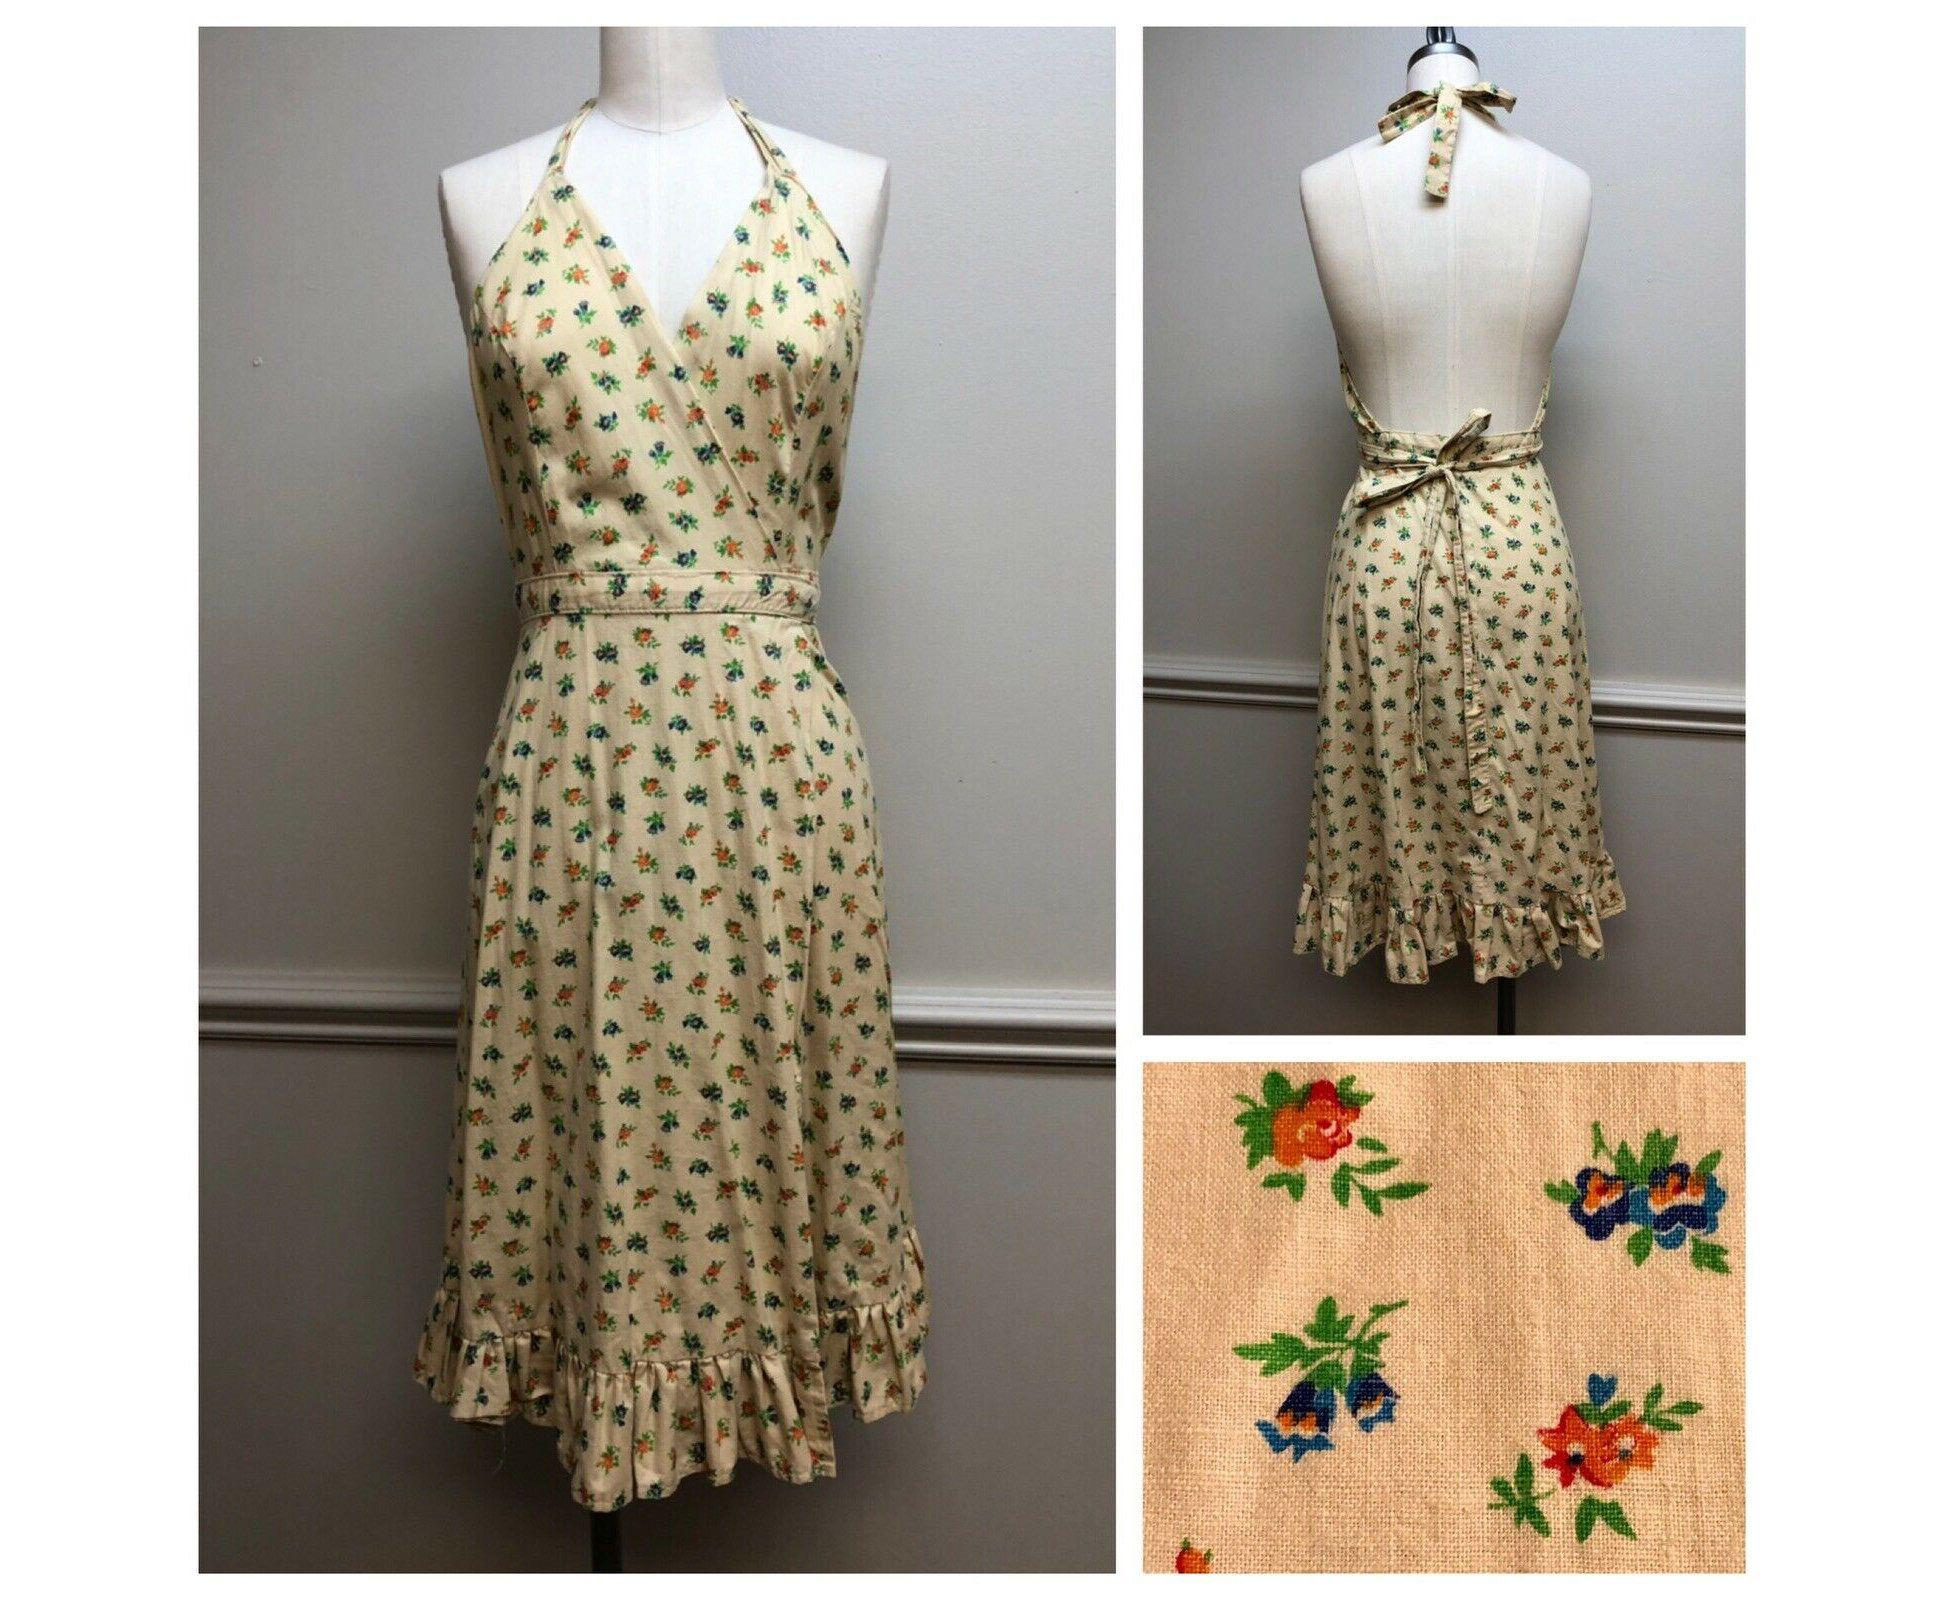 Vintage 1970s Halter Wrap Dress Floral 70s Sundress Open Back Dress Handmade Boho Clothing Earth Tones By Proveauxvintage On Etsy Https Www Etsy Com L [ 1600 x 1944 Pixel ]